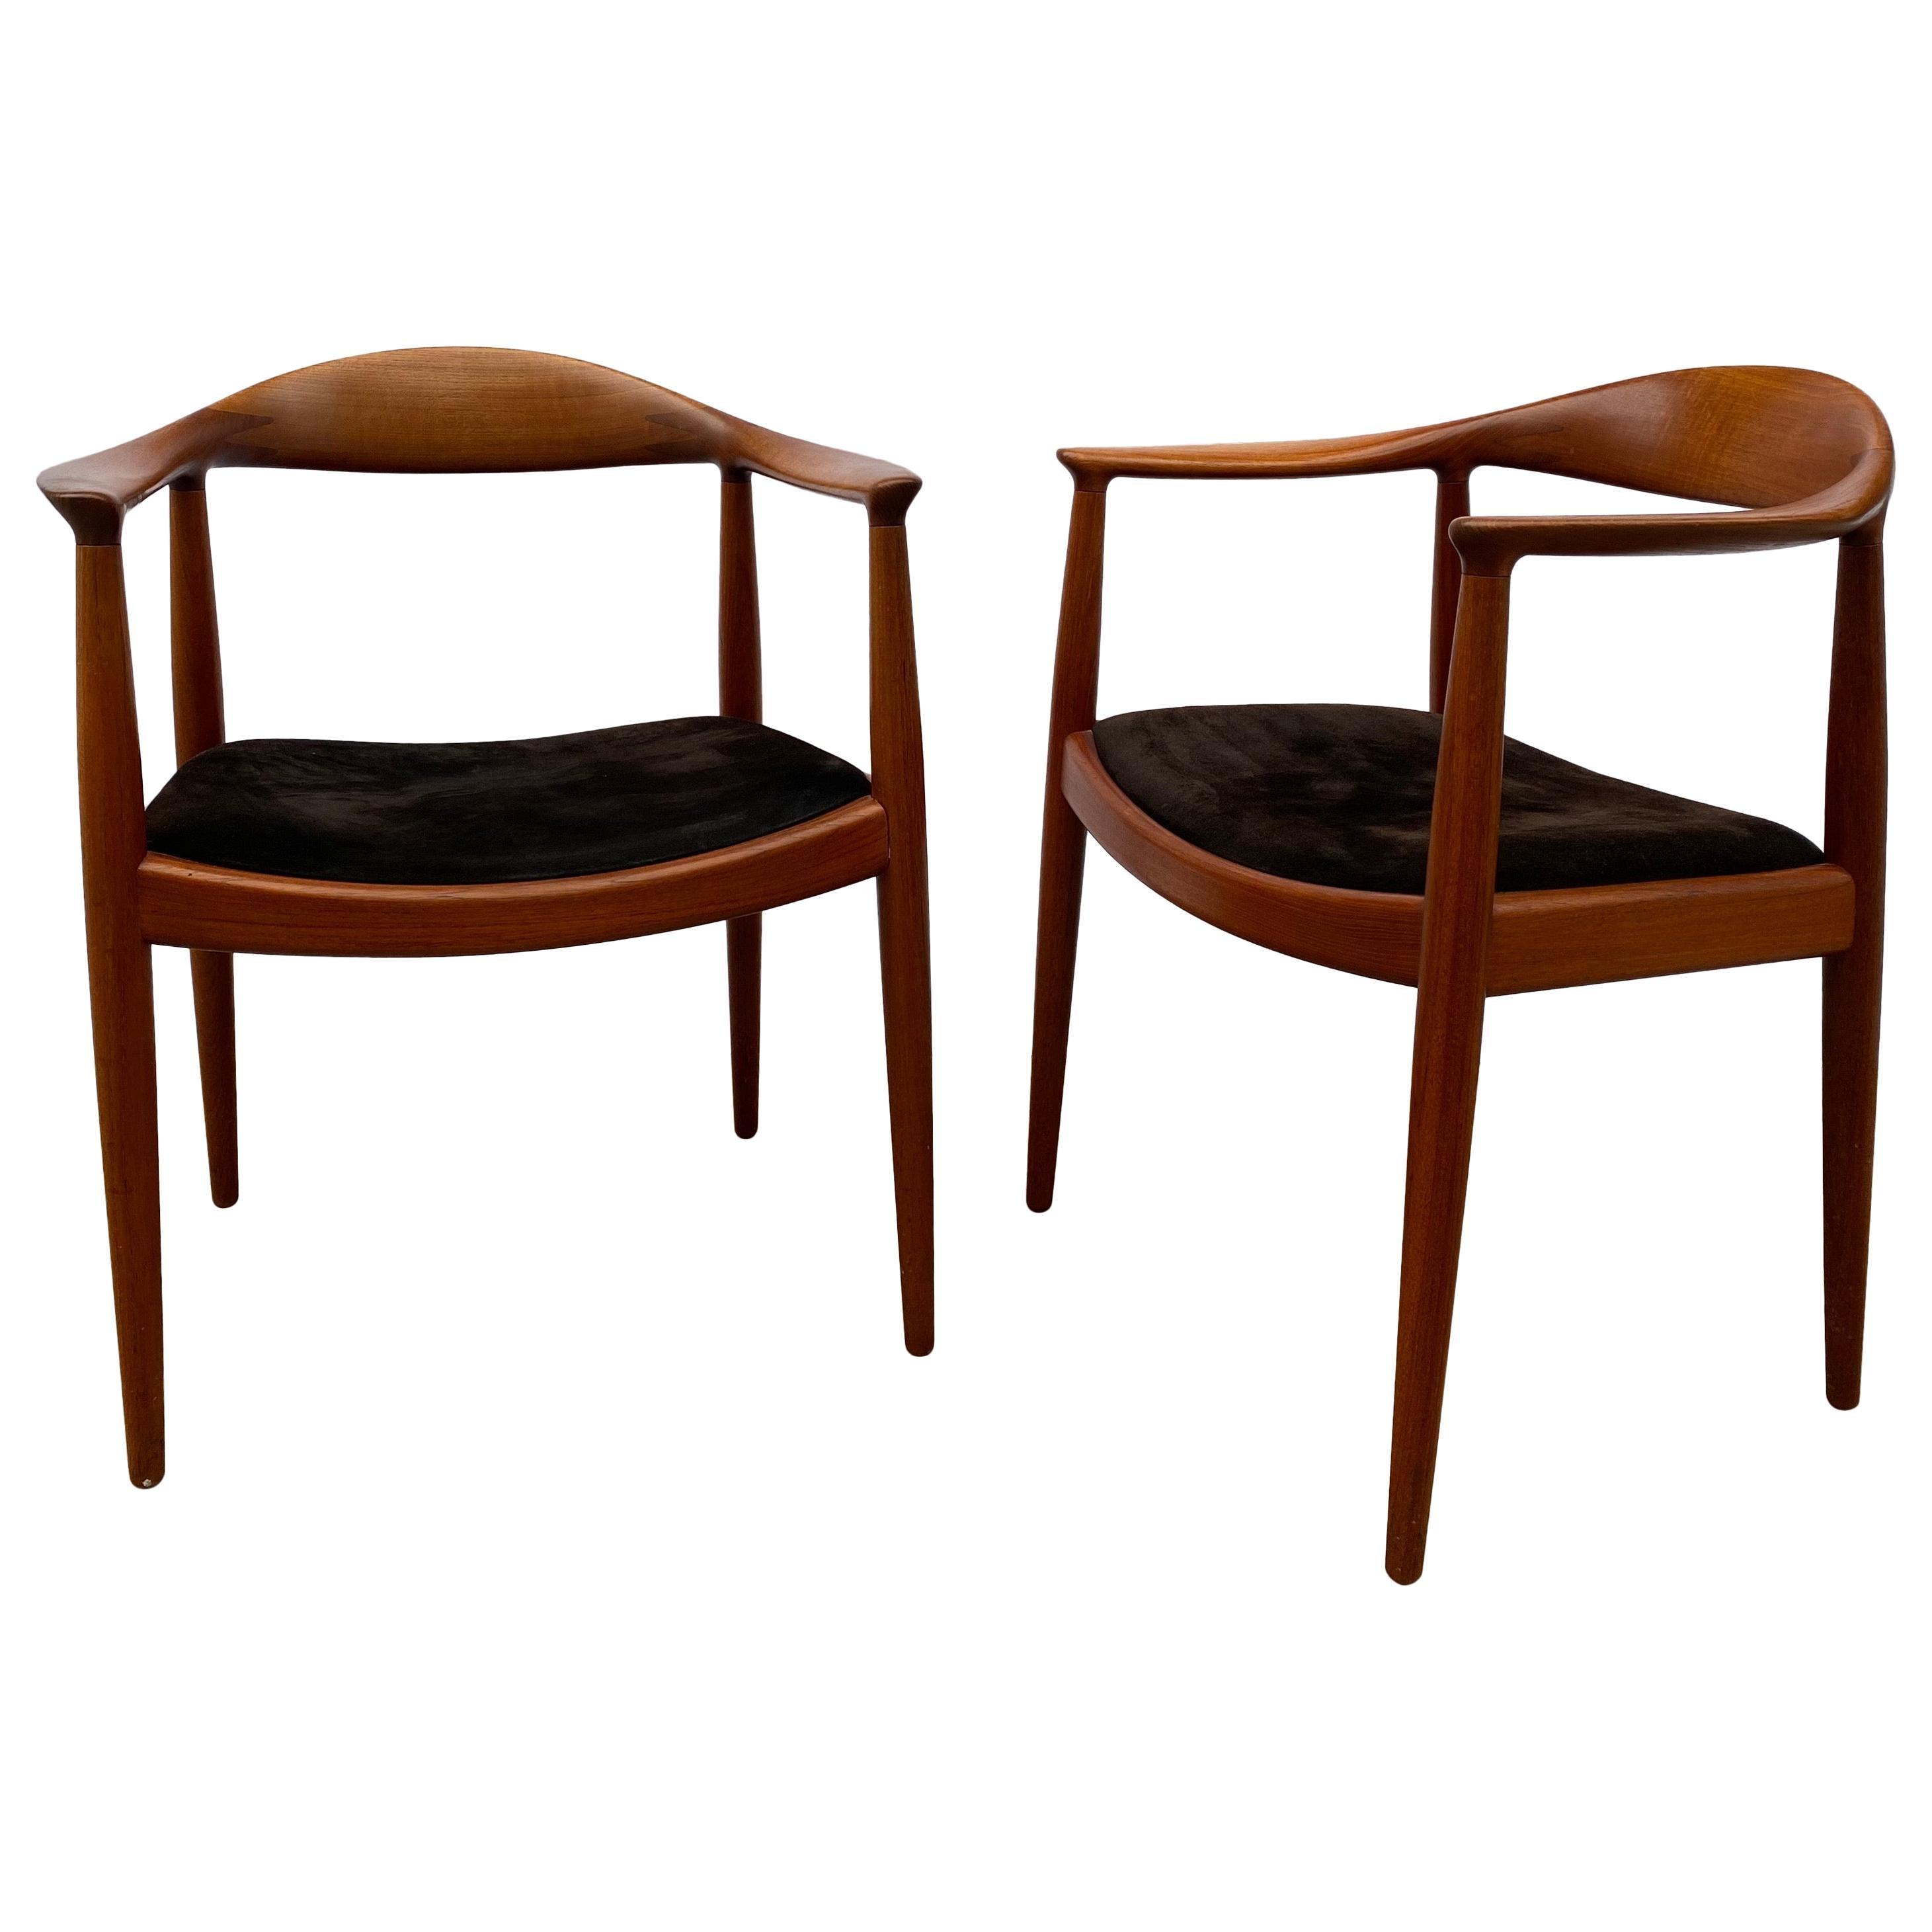 "Hans Wegner Pair of Round Chairs/ ""The Chair"" for Johannes Hansen"